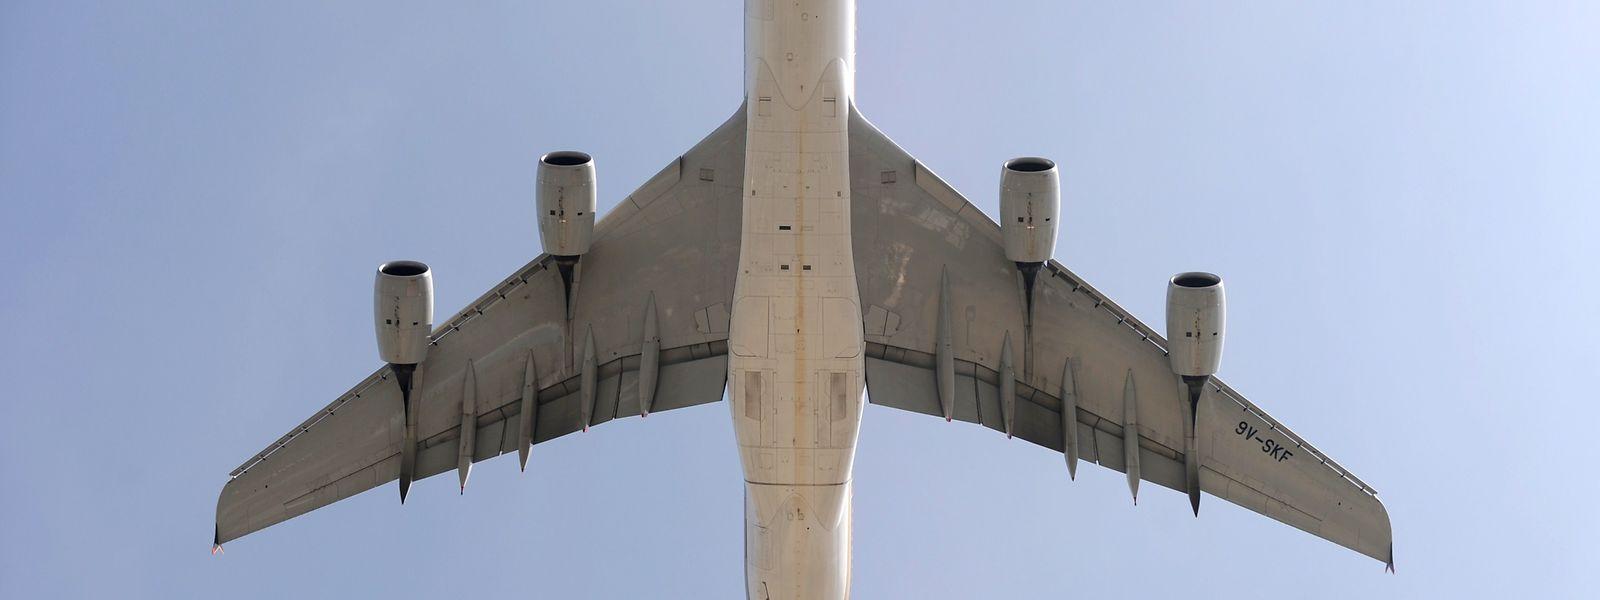 Passagierjet beim Abflug am Flughafen Roissy-Charles-de-Gaulle.